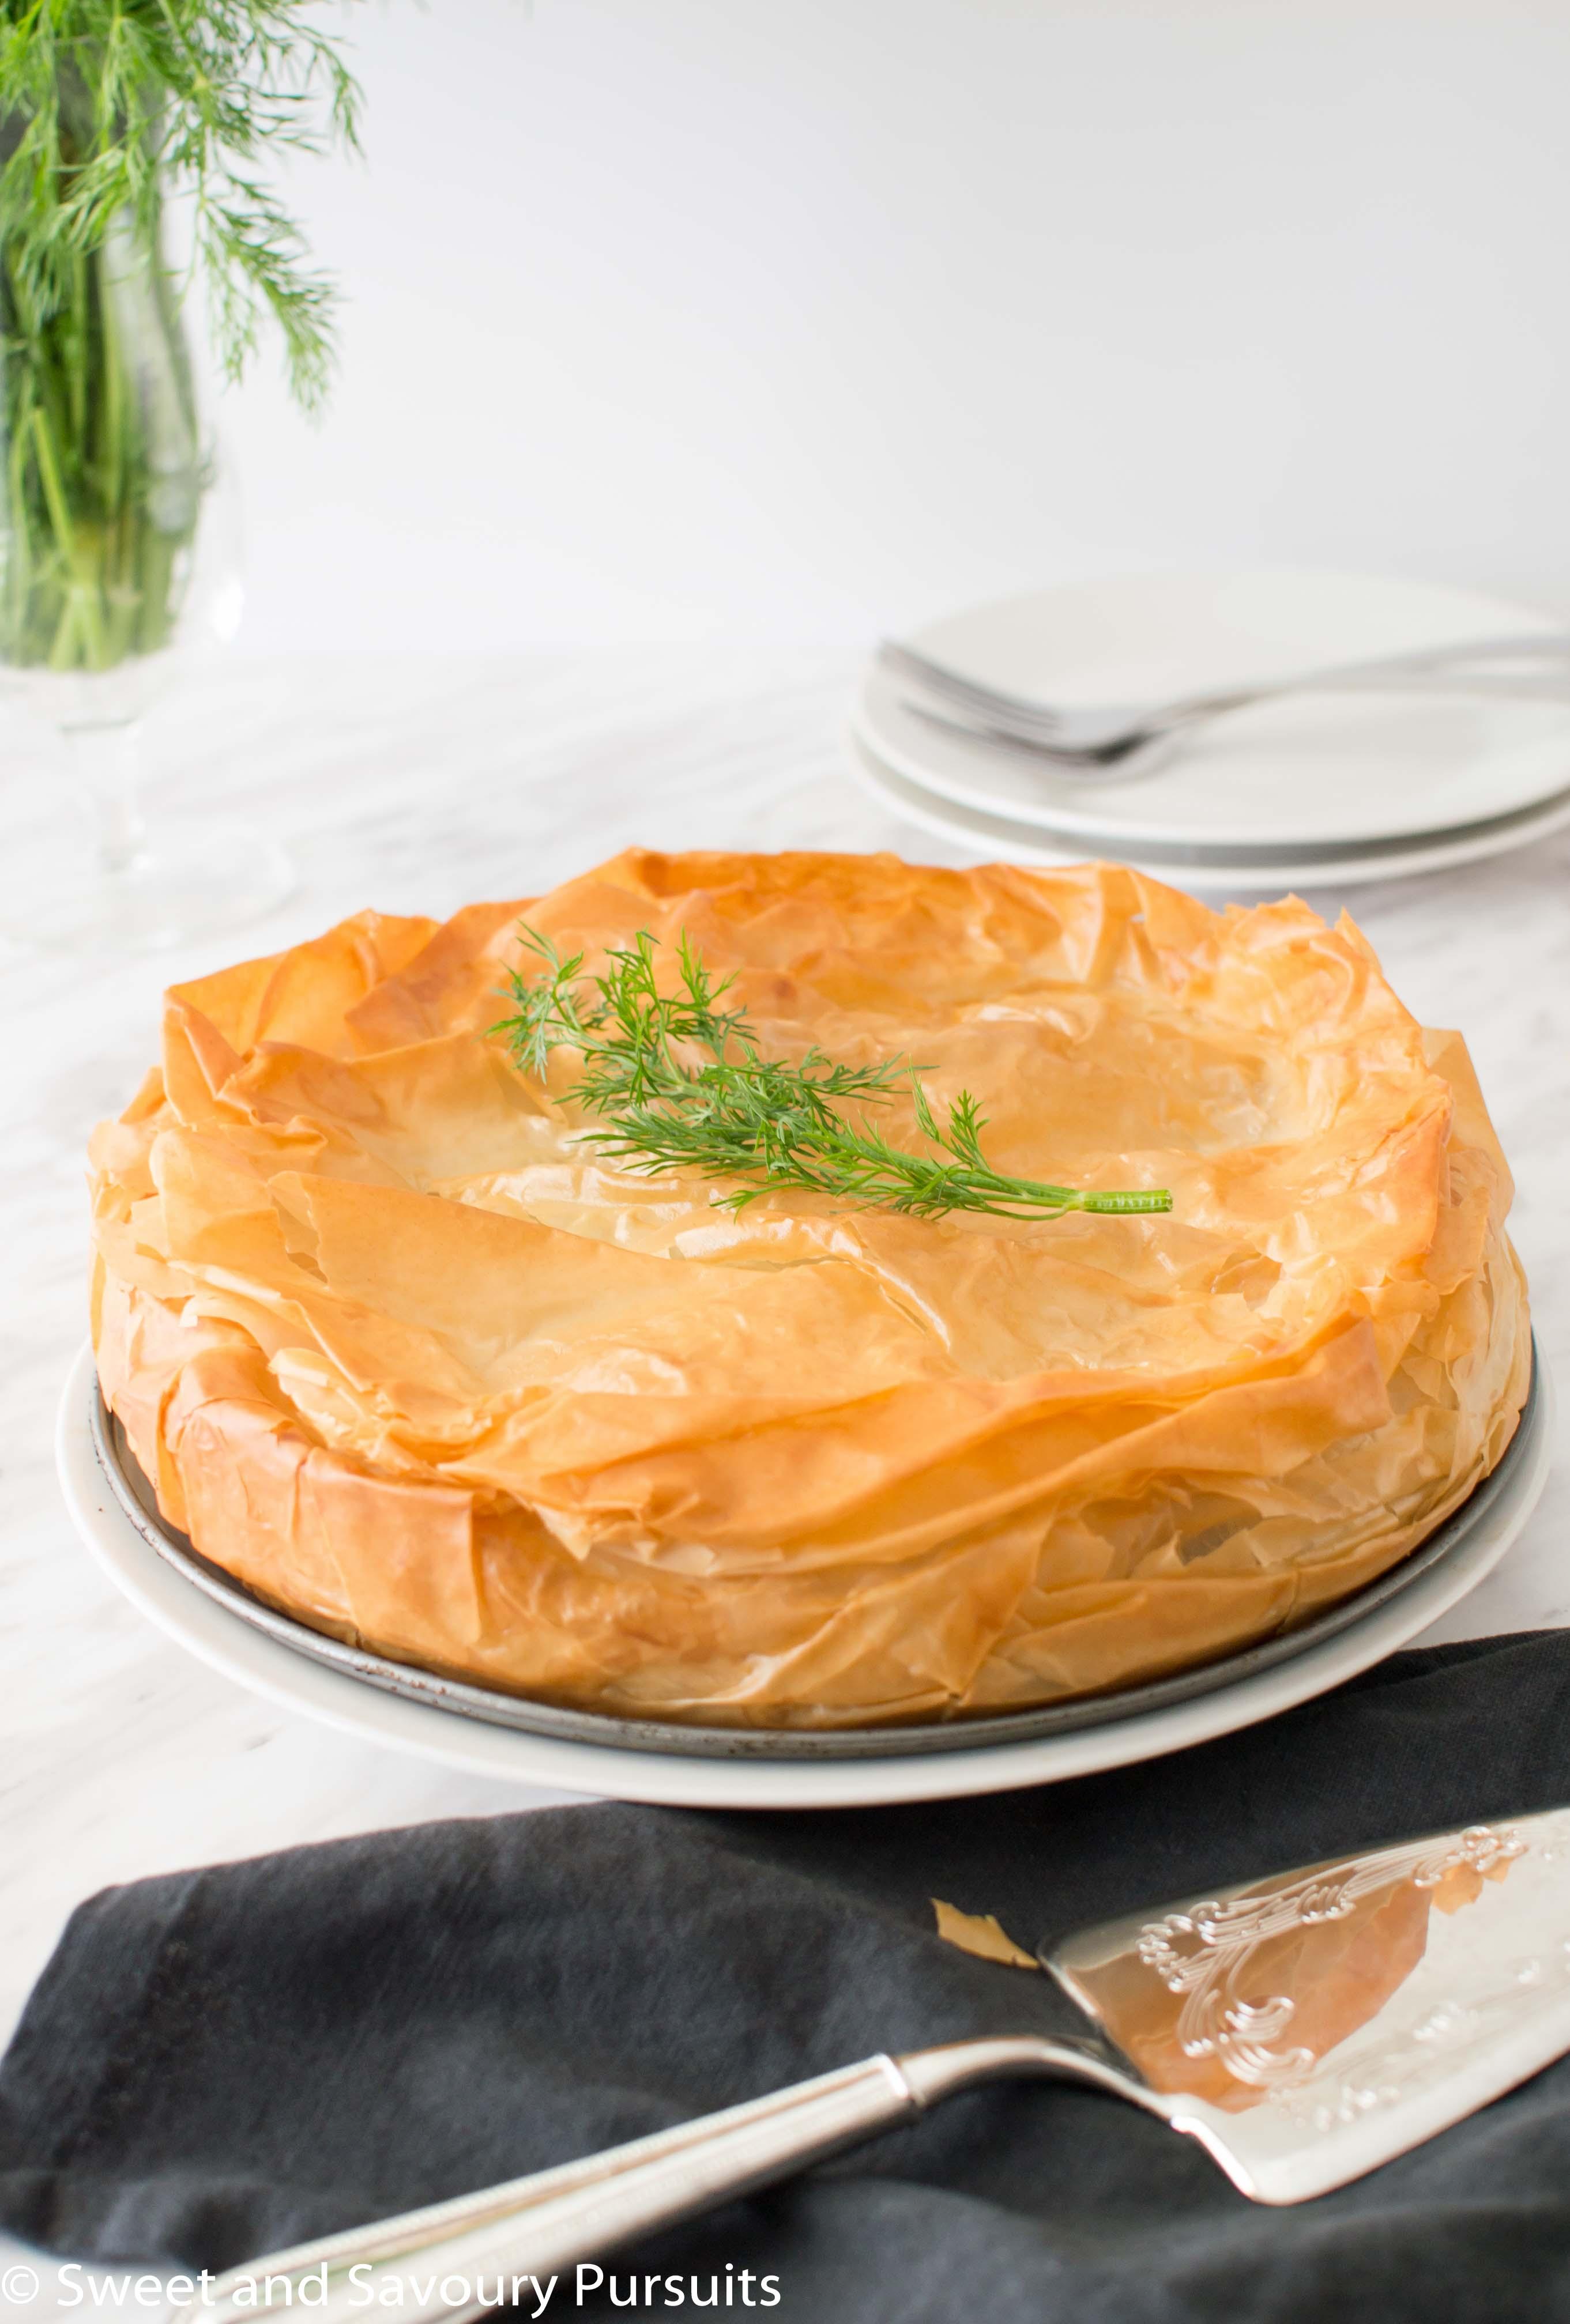 One Spanakopita Pie made with phyllo dough.